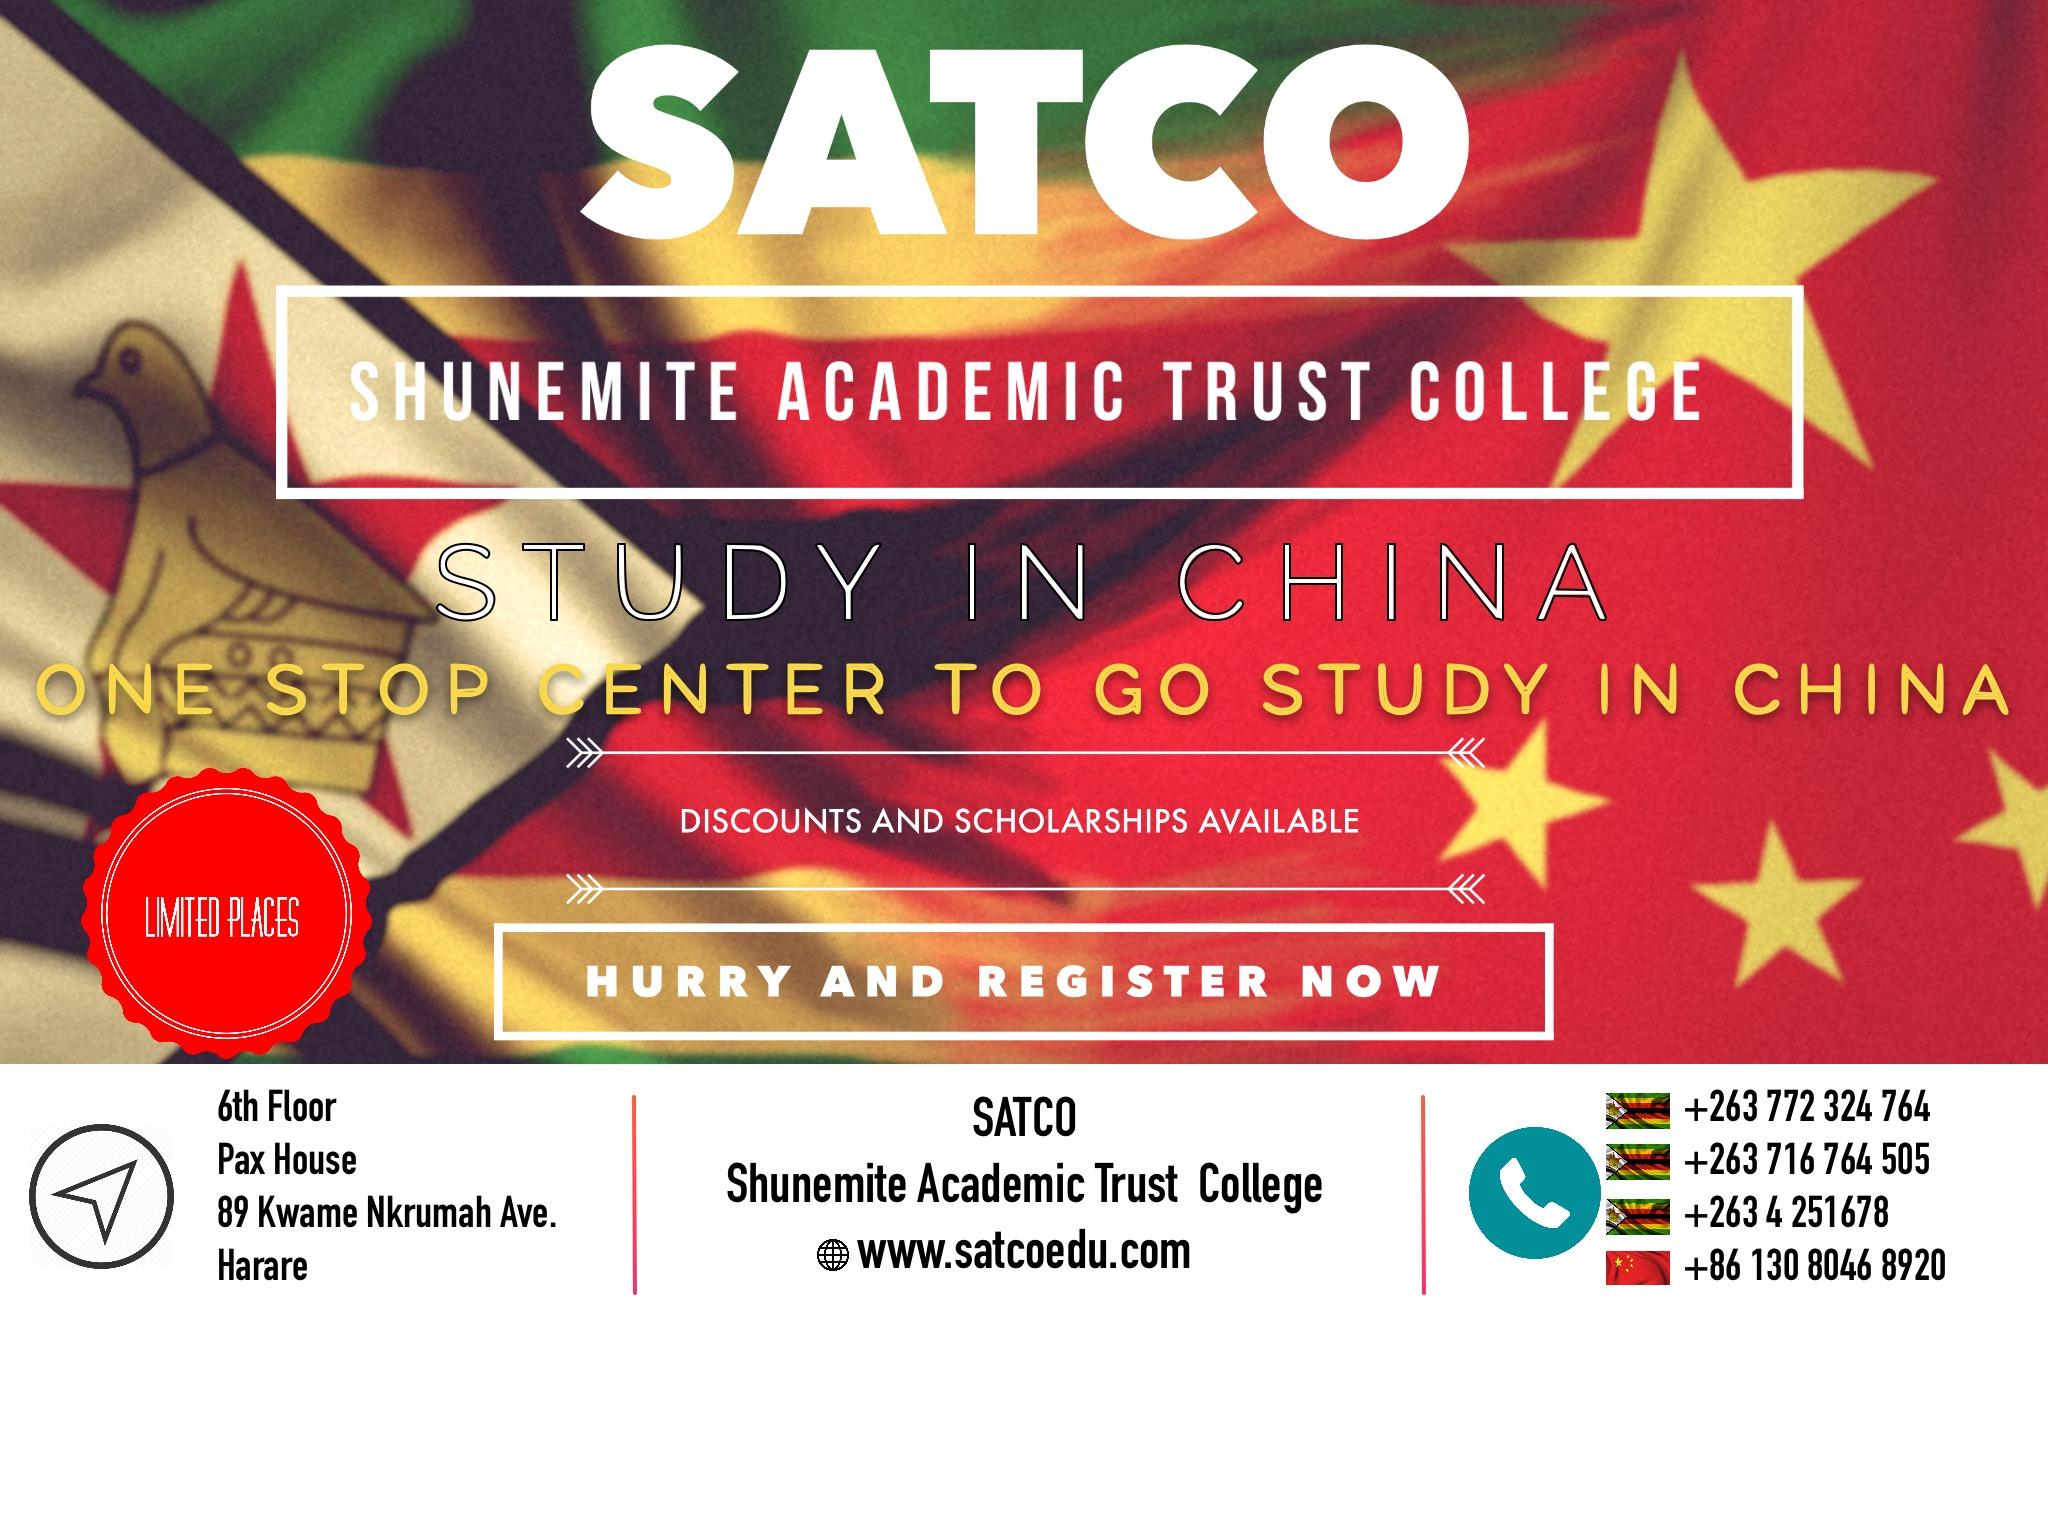 satco poster